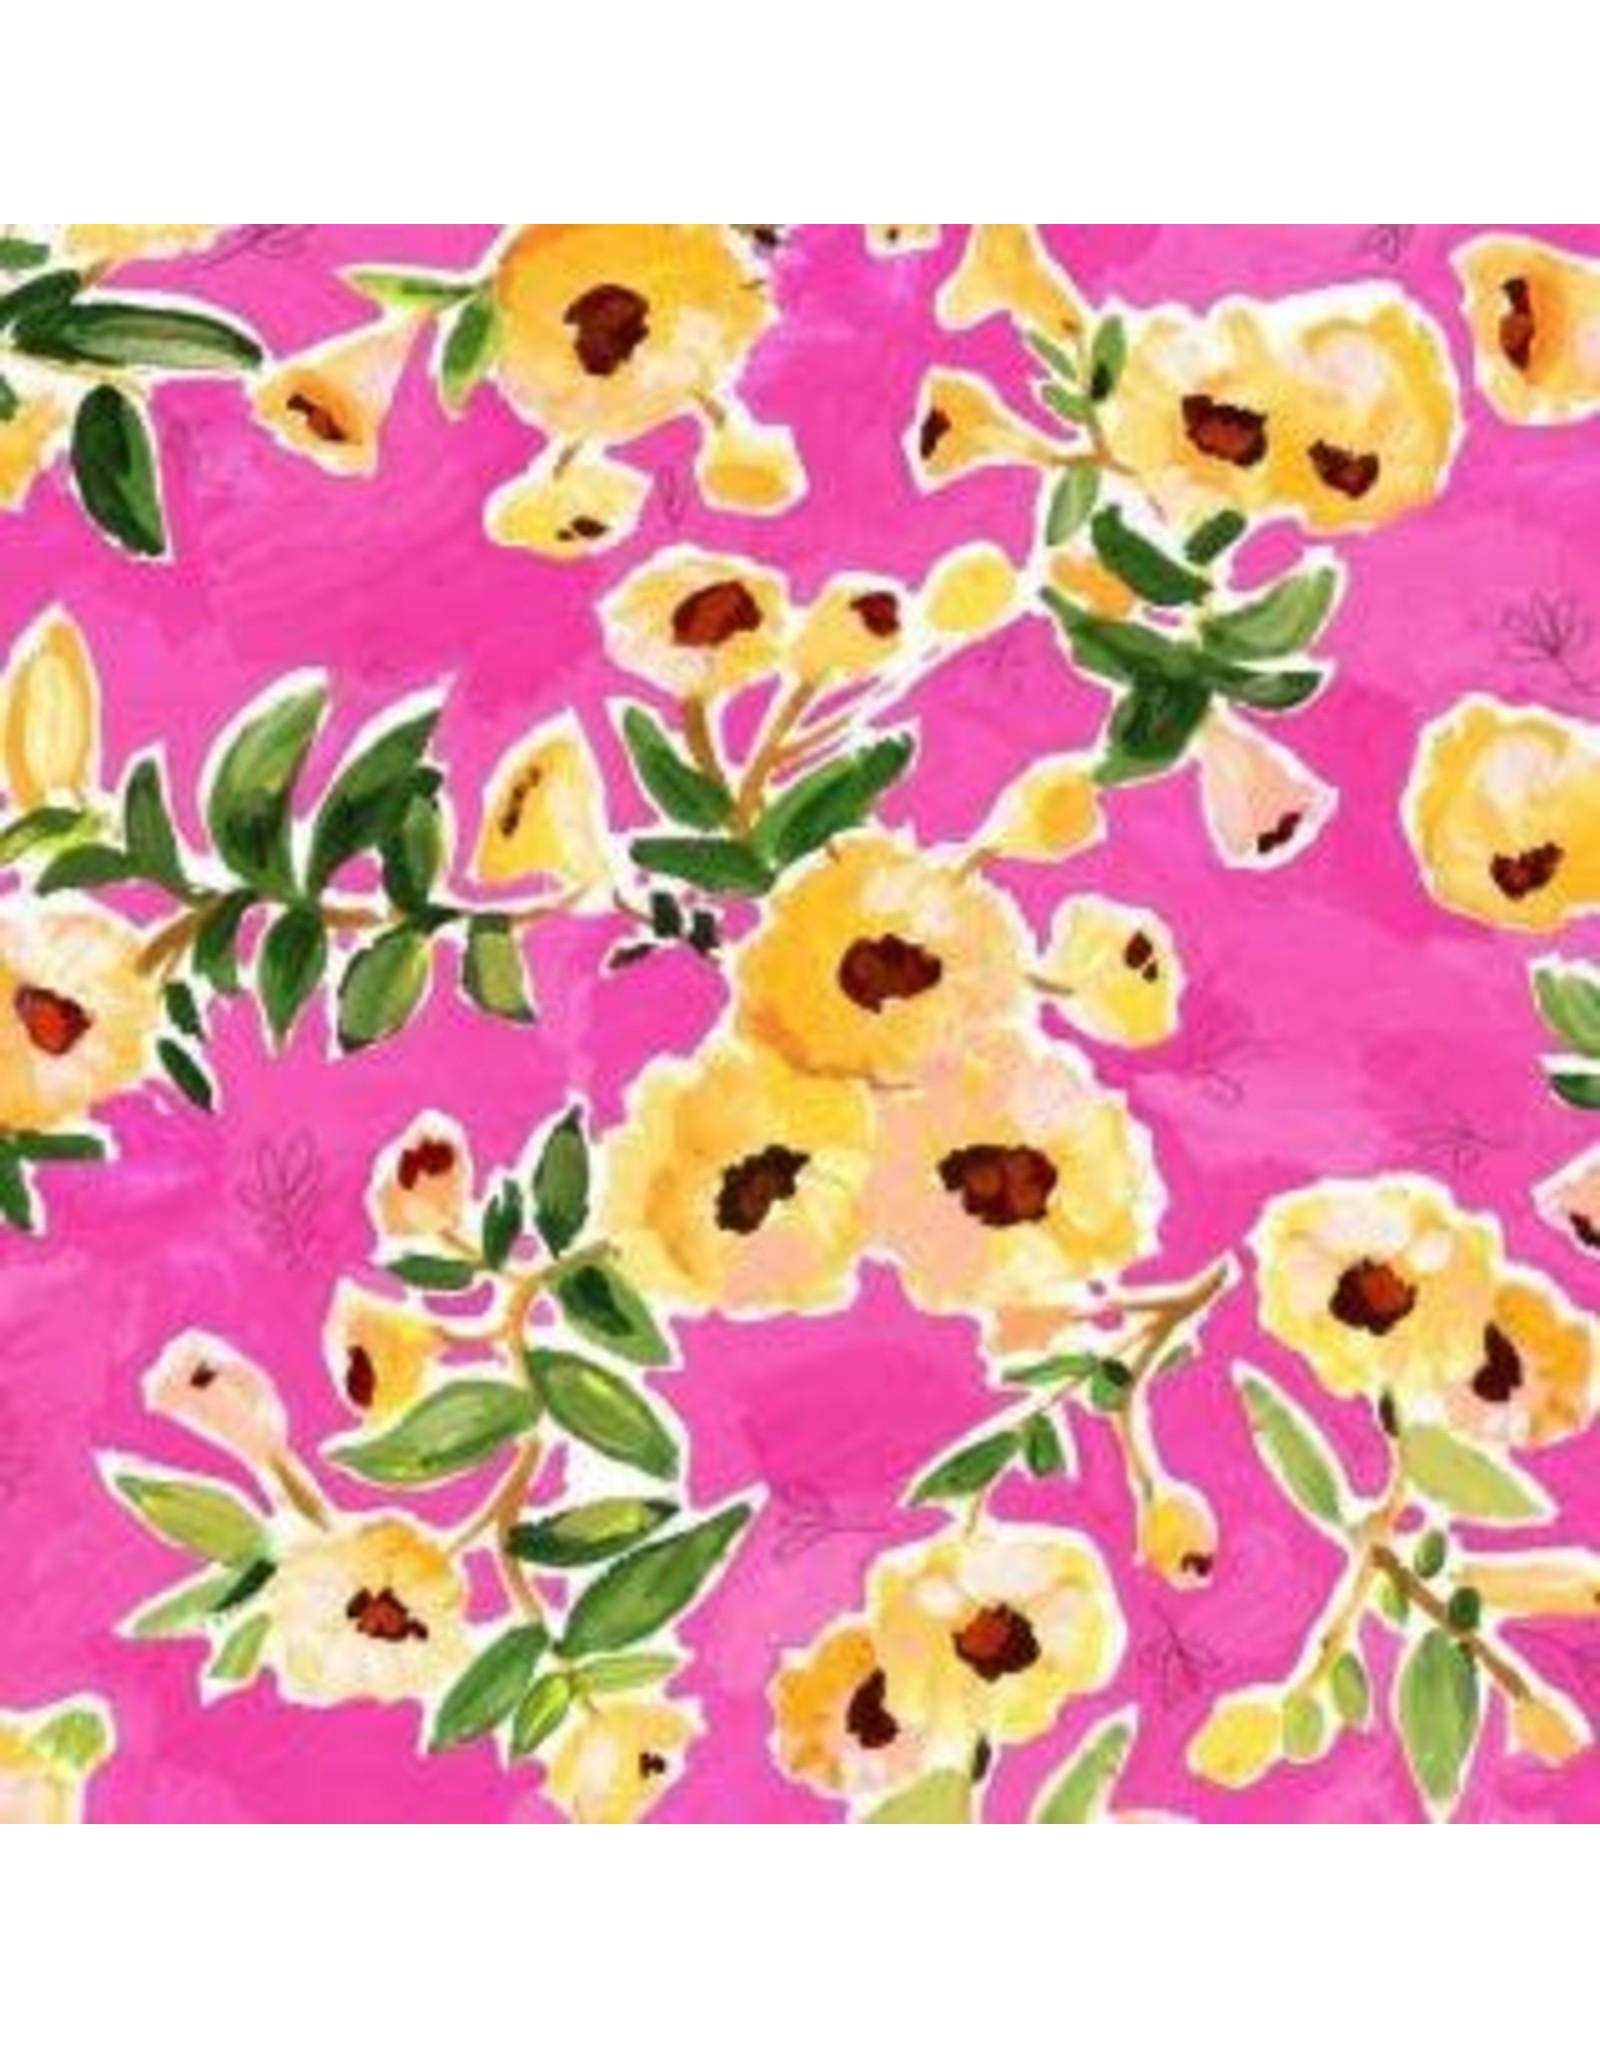 August Wren ON SALE-Viva Mexico!, Flower Wall in Multi, Fabric FULL-Yards